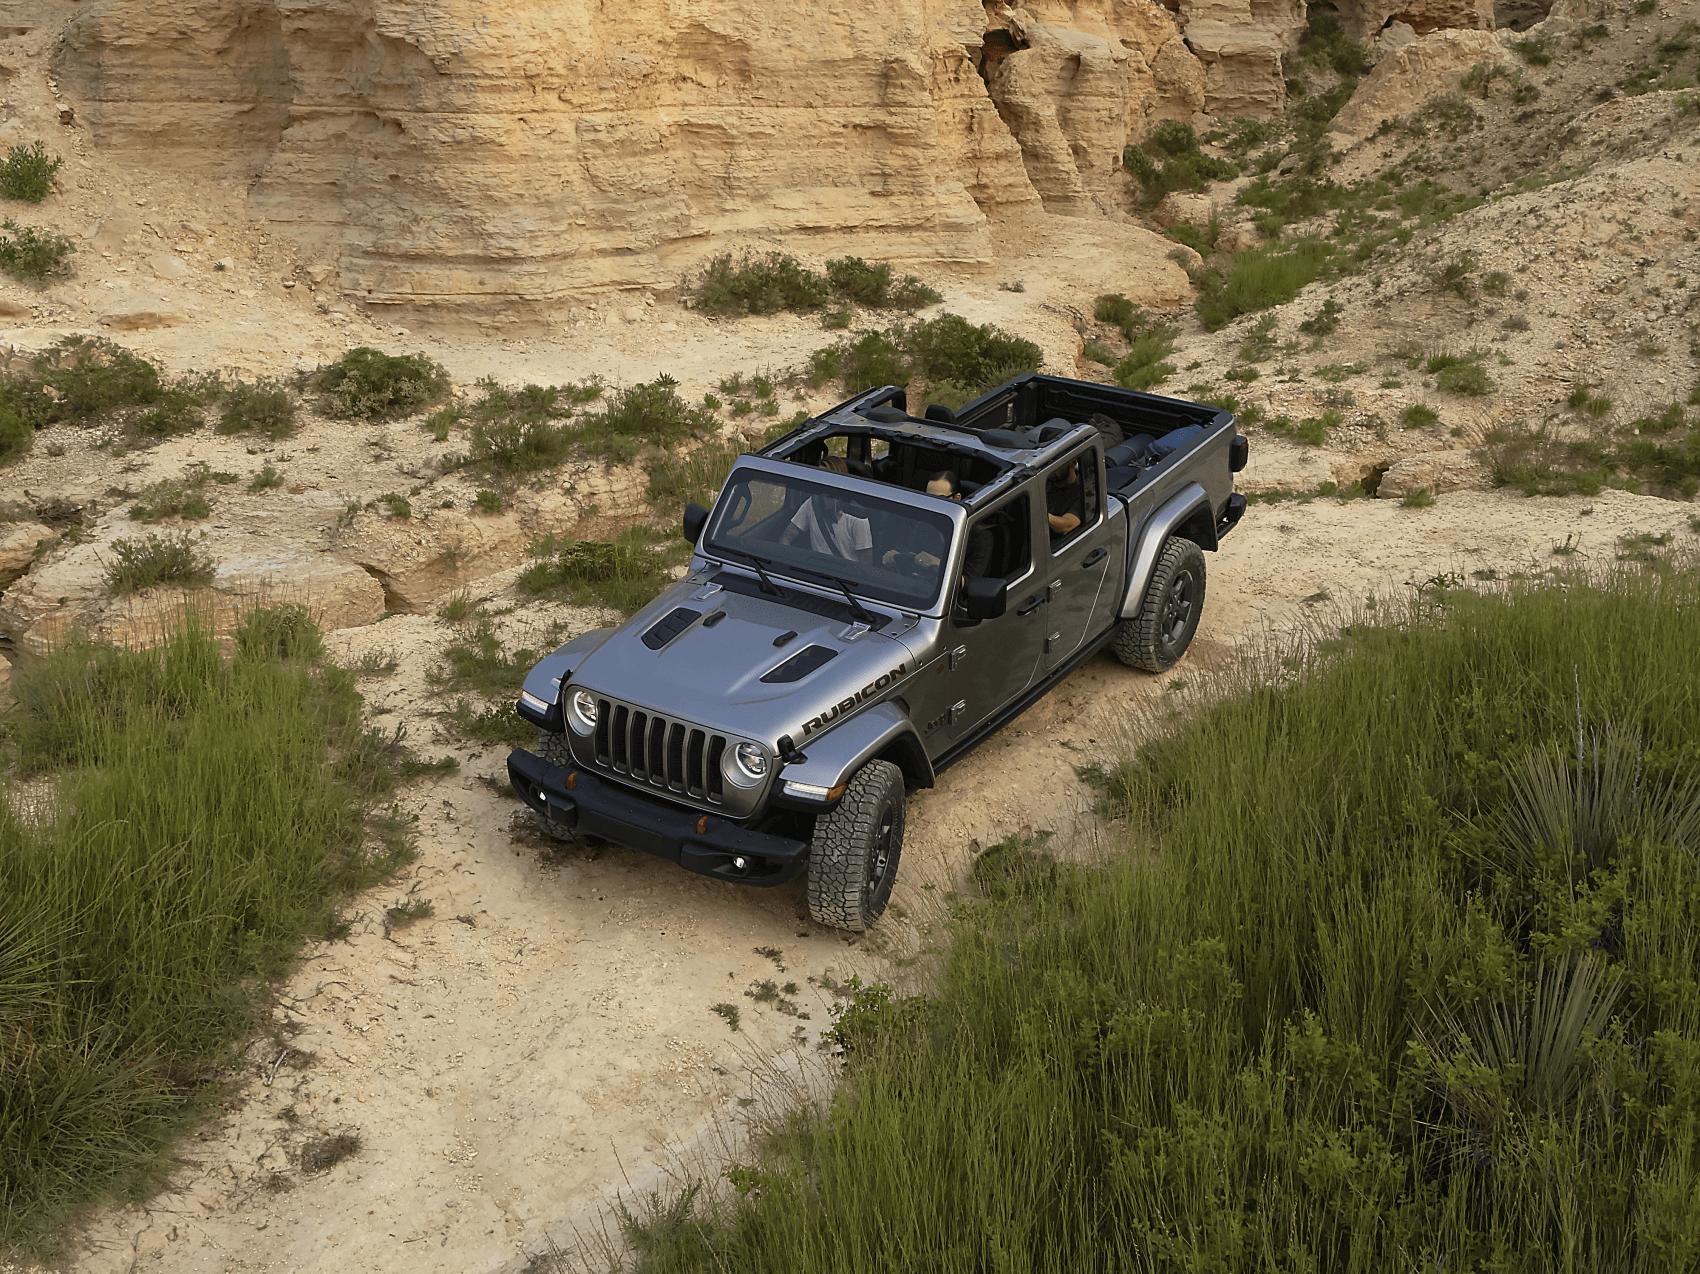 2021 Jeep Gladiator Gray Off-Roading